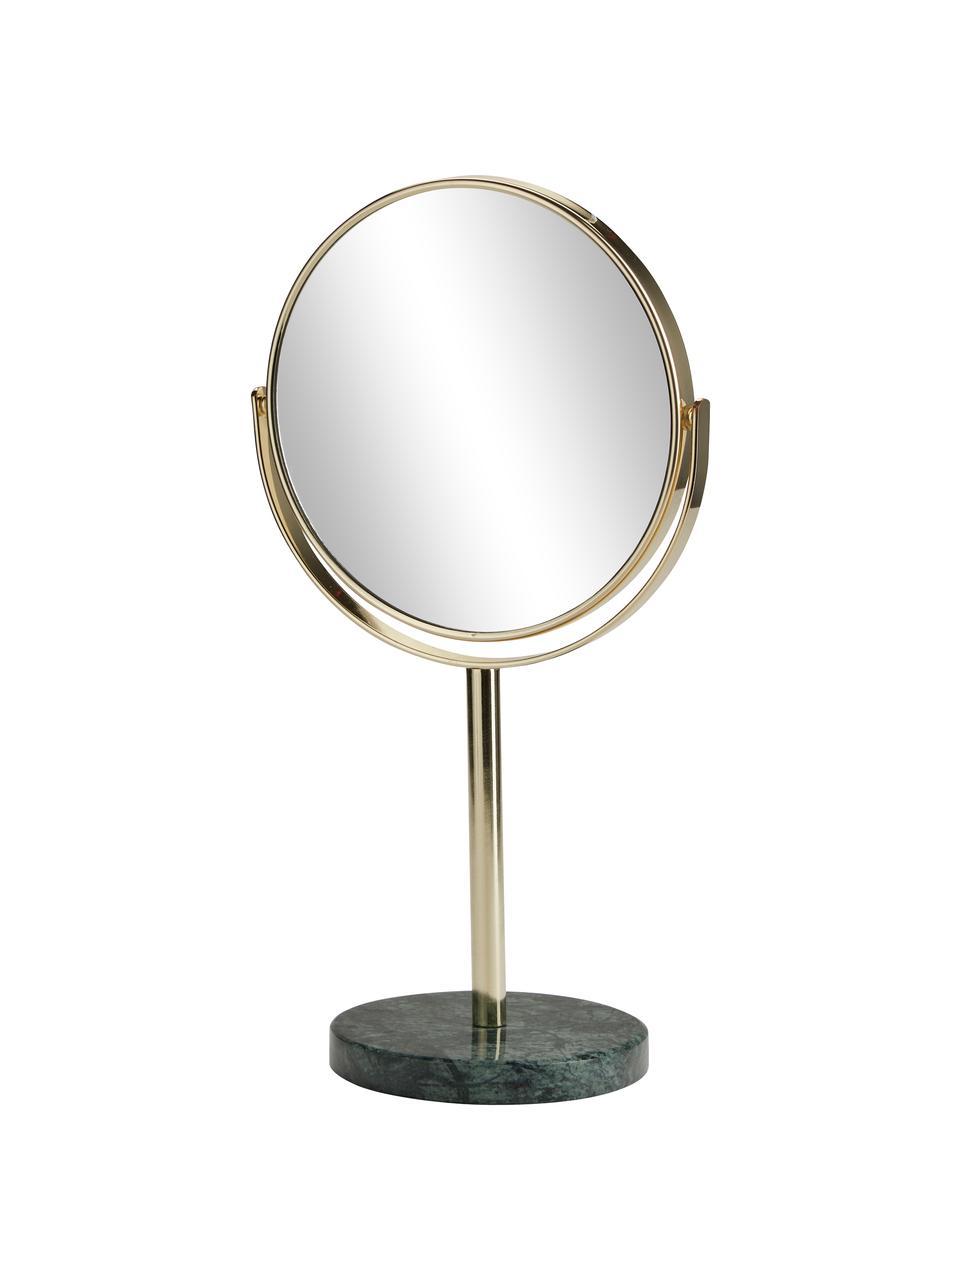 Kozmetické zrkadlo s mramorovým podstavcom Ramona, Odtiene zlatej, zelená